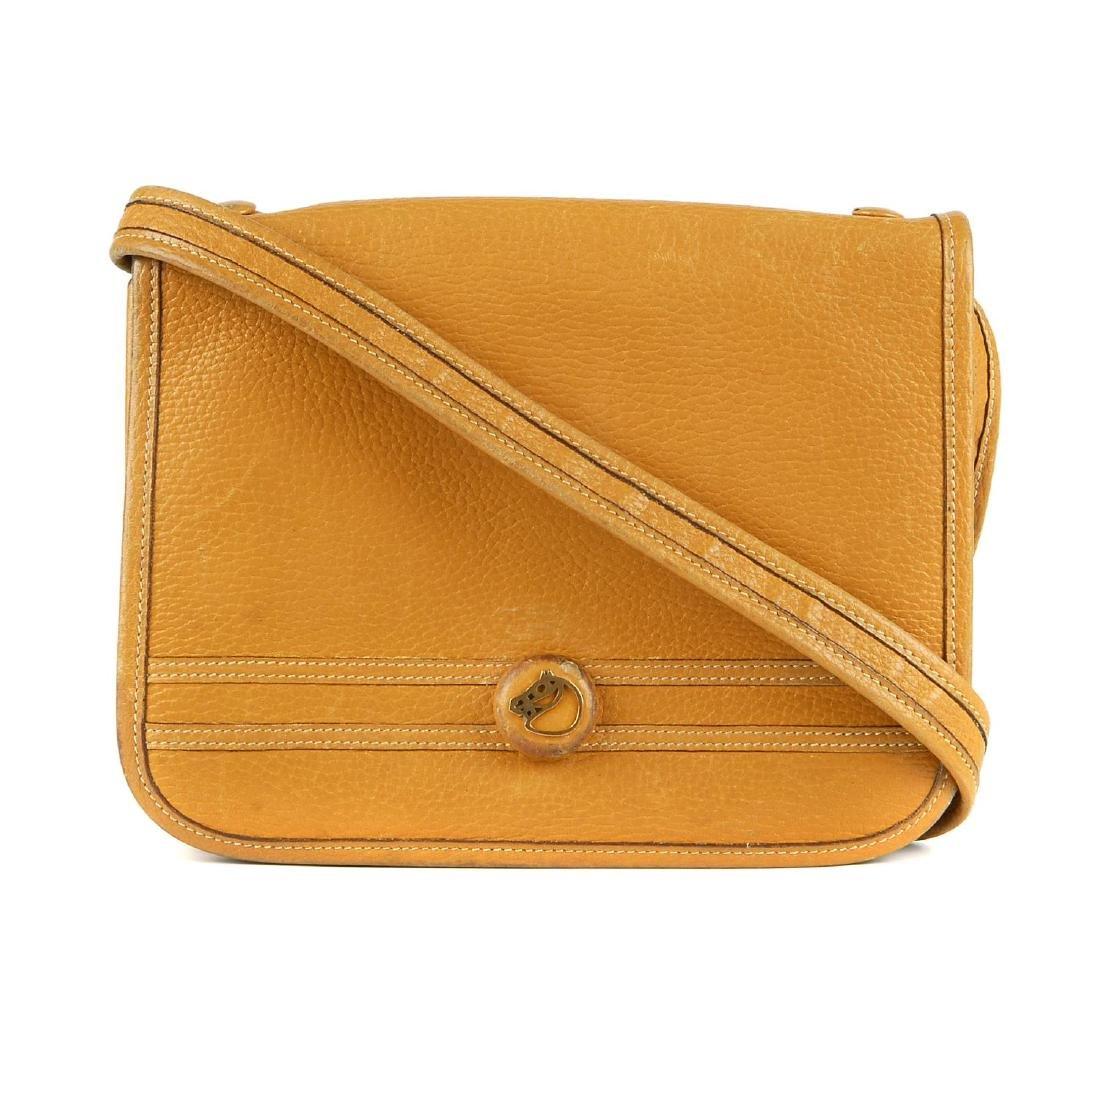 HERMÈS - a vintage Sac Besace handbag. Crafted from